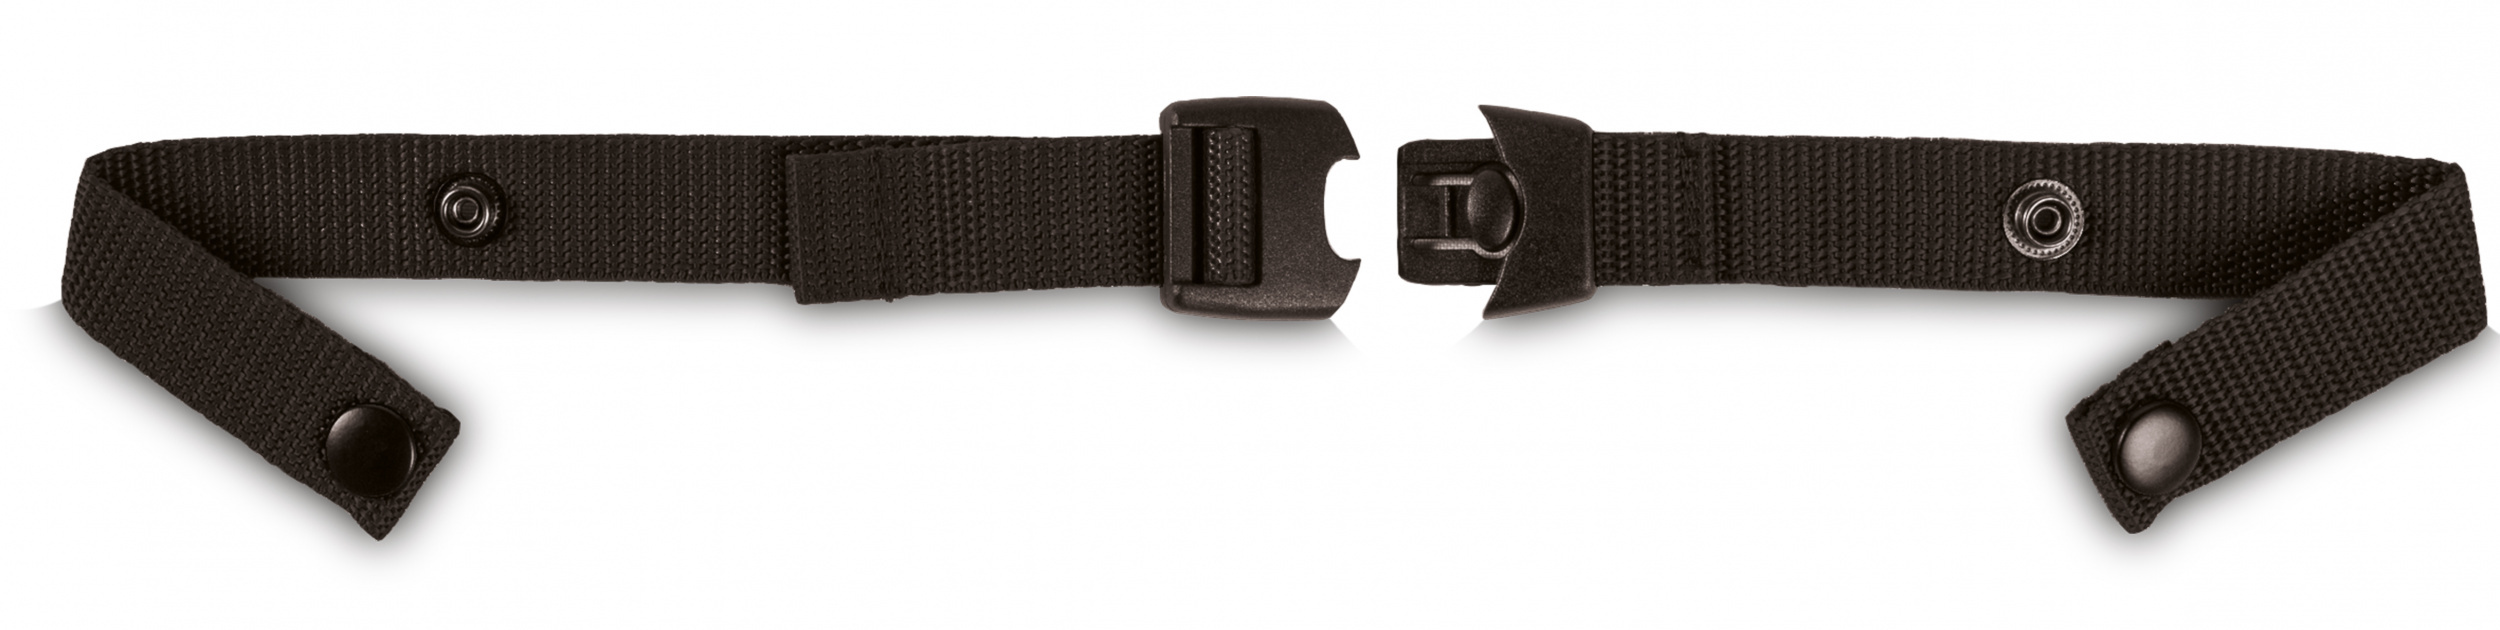 Worldpack Borstband 10228 Zwart